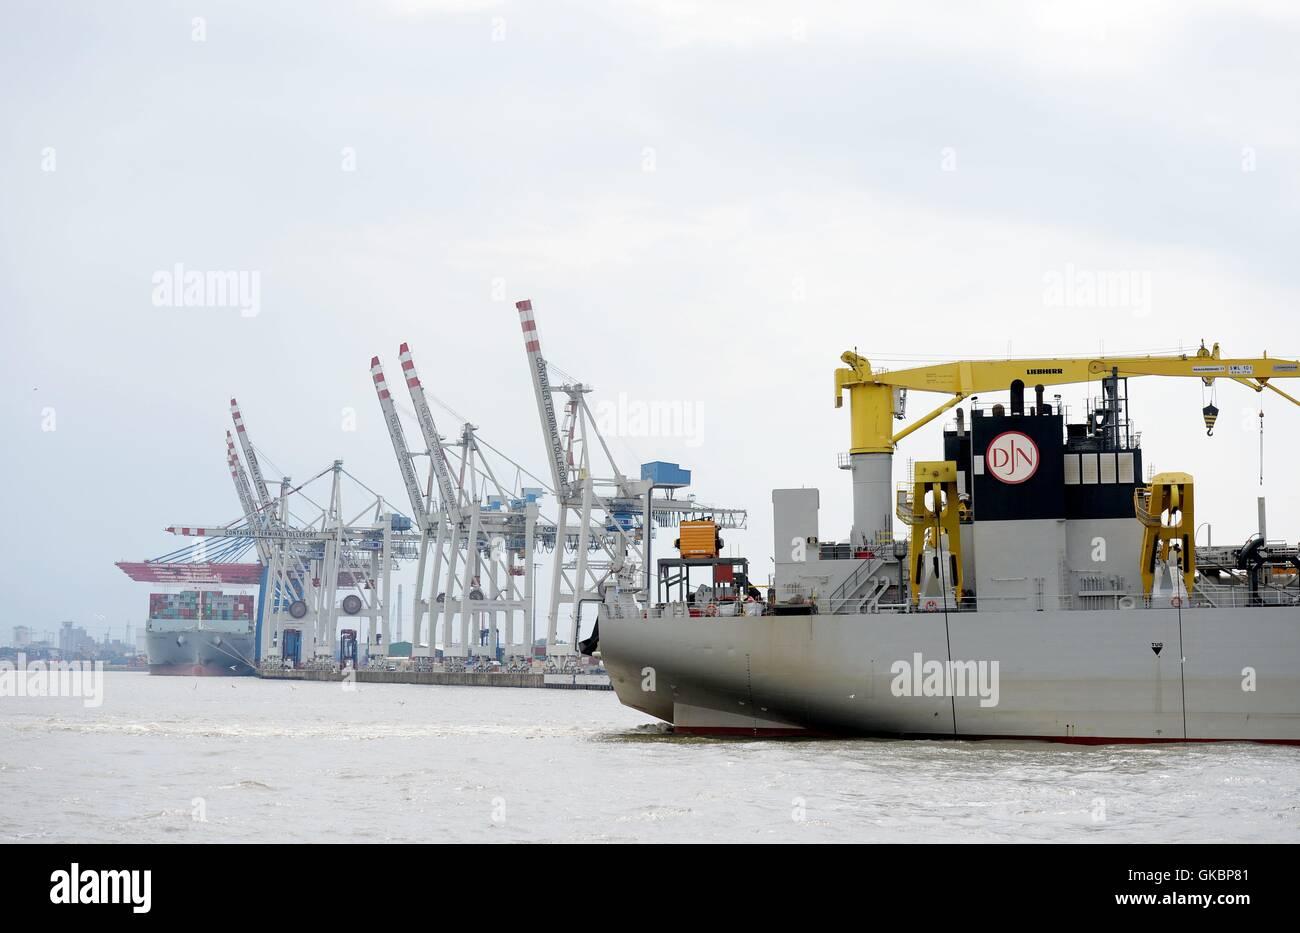 The hopper dredger 'Bartolomeu Dias' in the port of Hamburg, captured on 30 July 2016. | usage worldwide - Stock Image